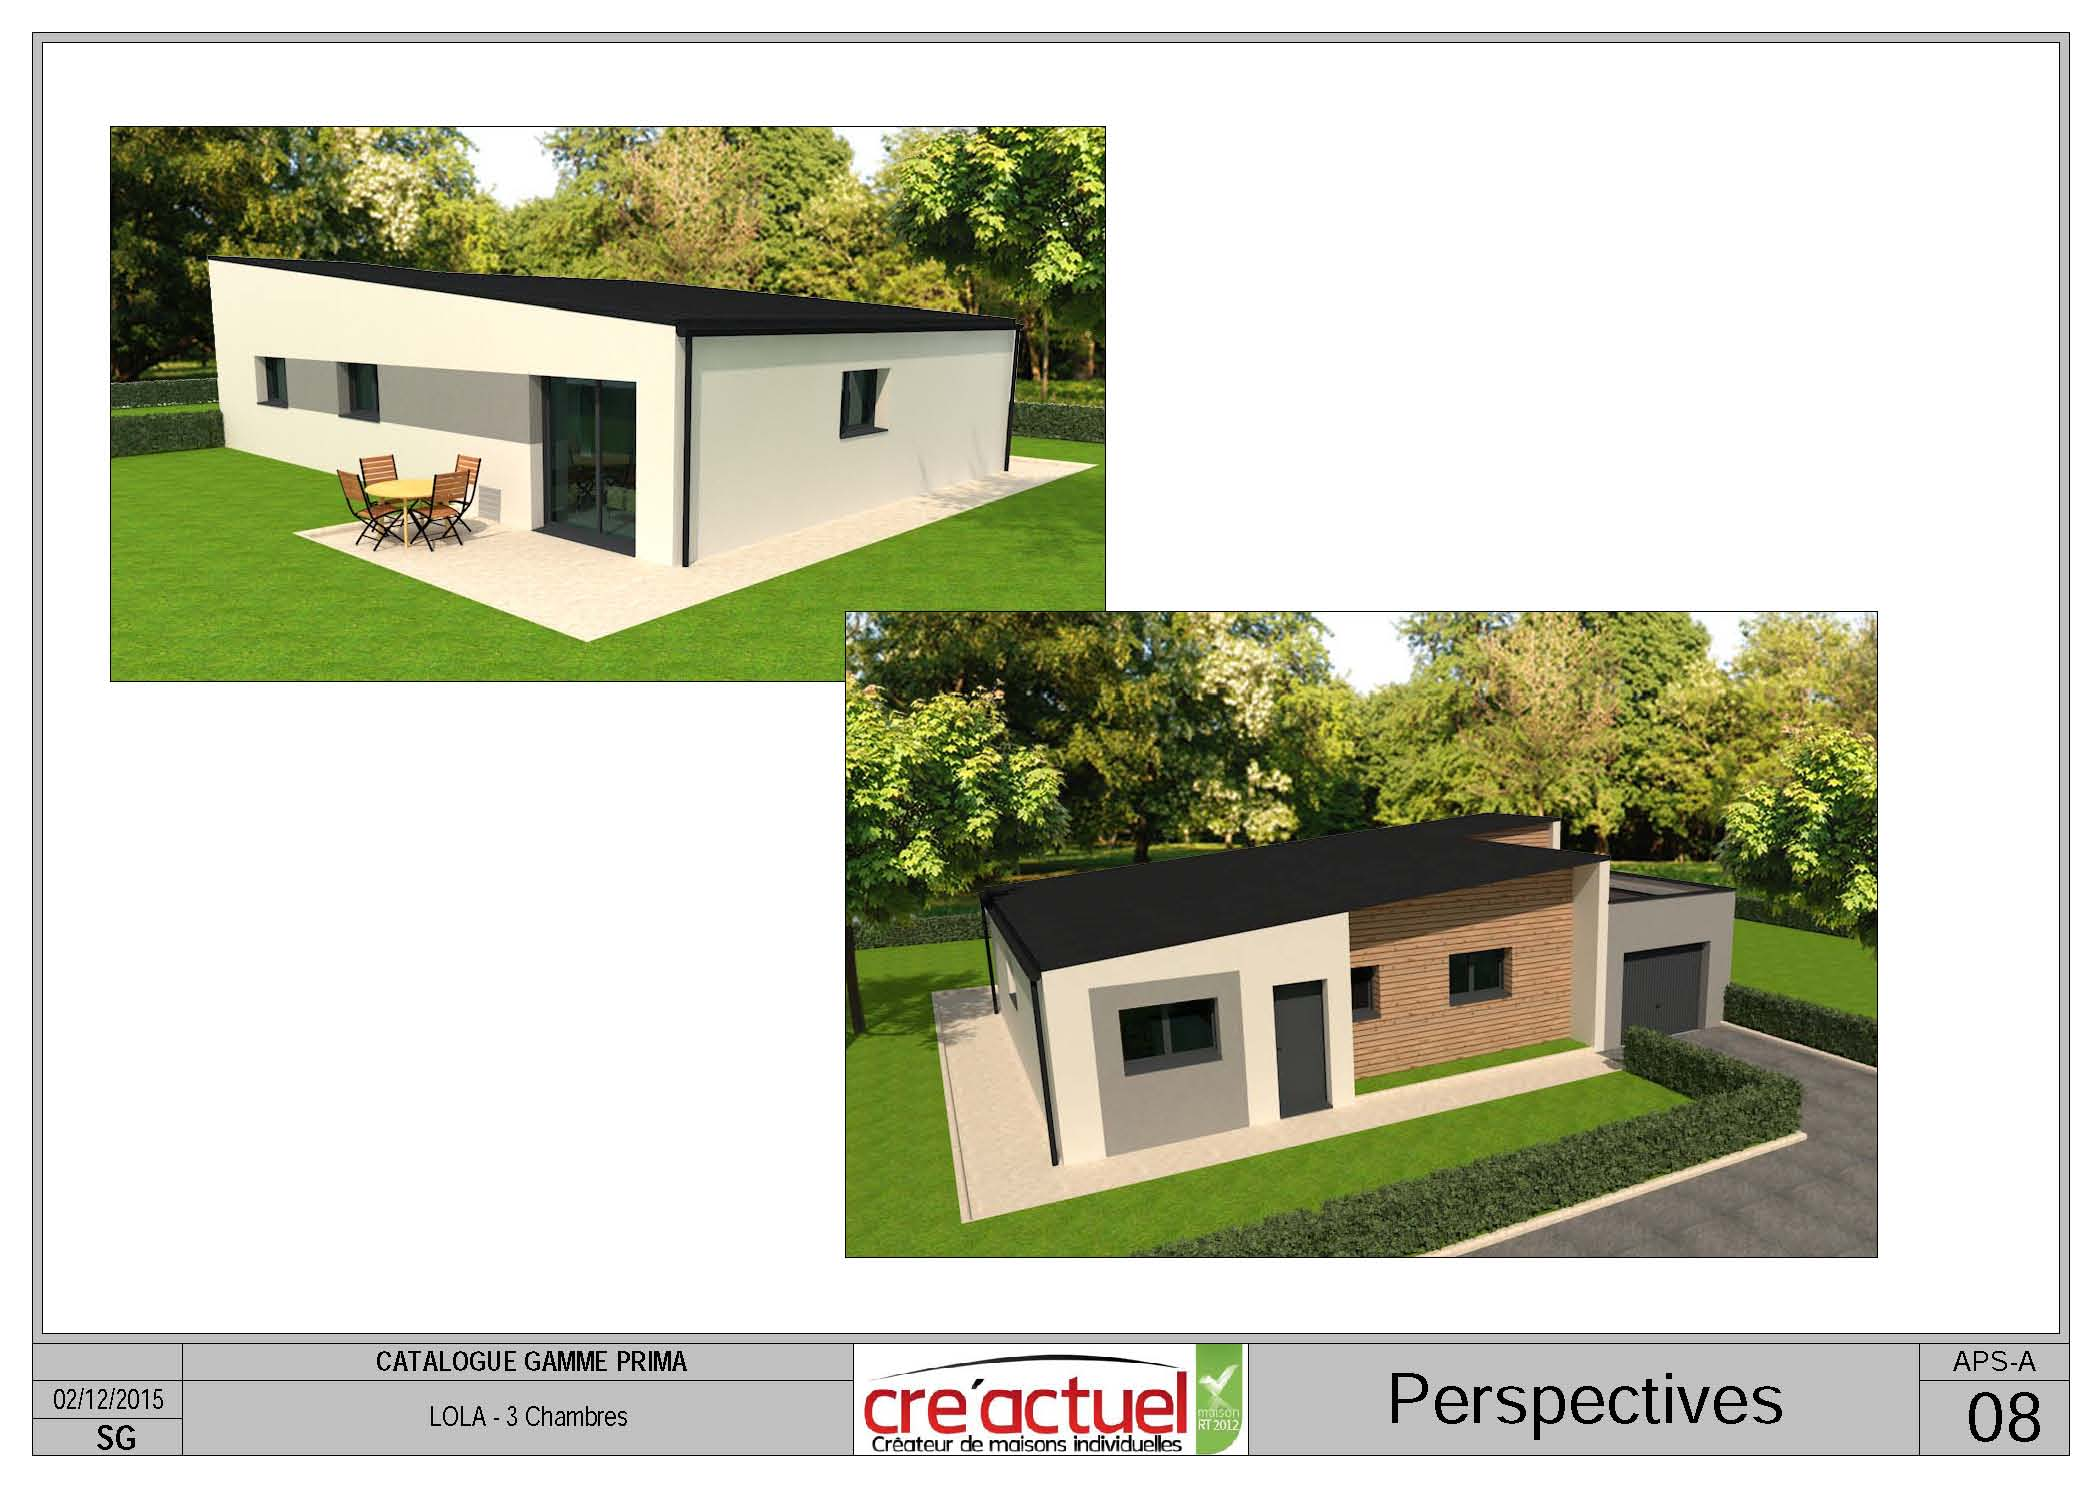 cre sa maison gallery interesting beautiful frdivinity. Black Bedroom Furniture Sets. Home Design Ideas